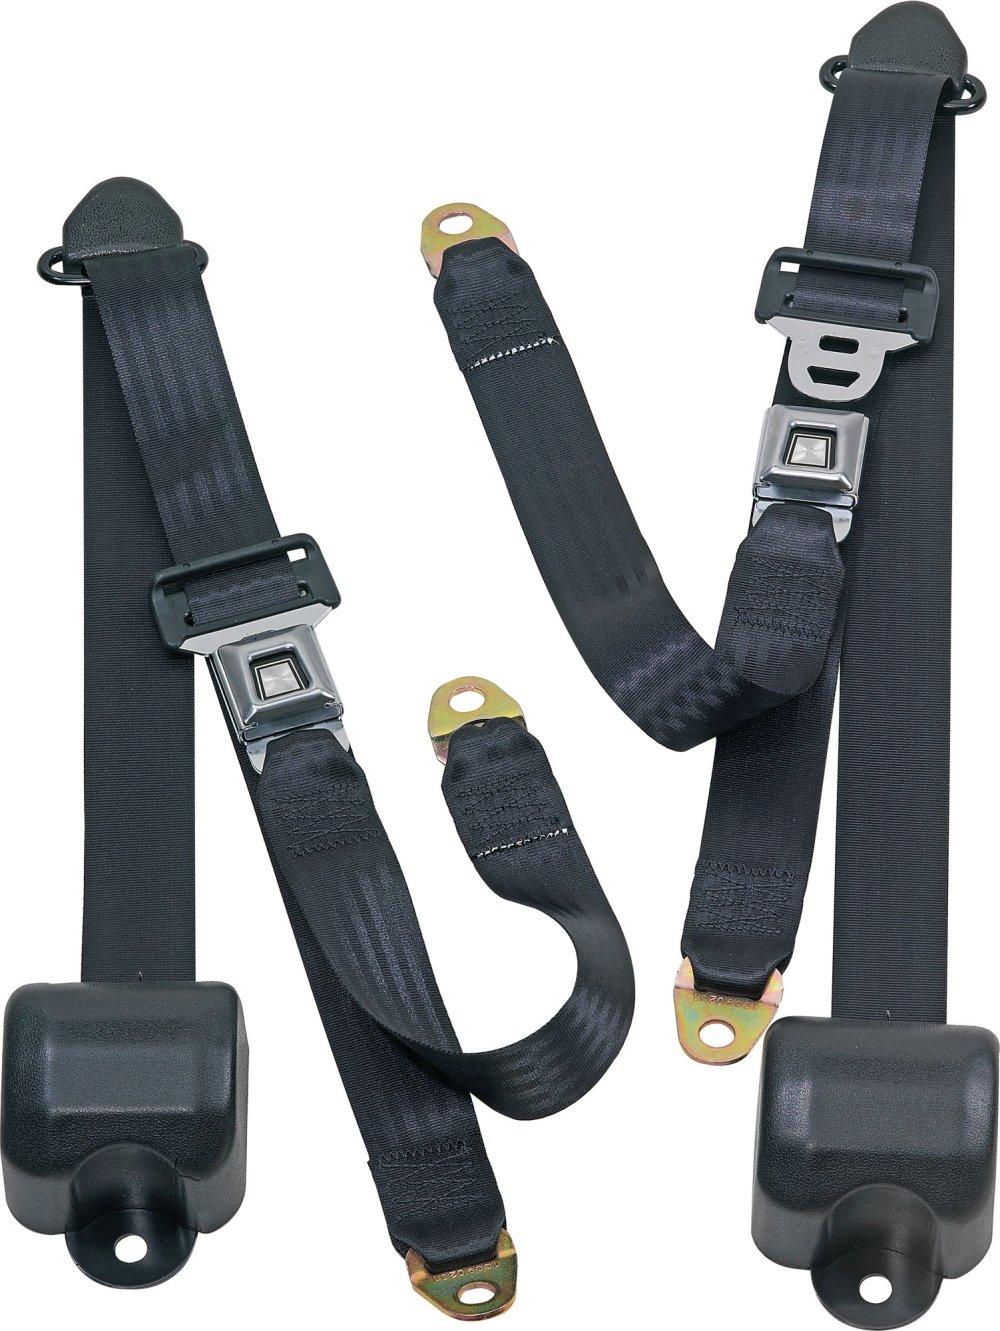 medium resolution of seatbelt solutions front metal push button 3 point retractable belts for 82 91 jeep cj 5 cj 7 cj 8 scrambler wrangler yj